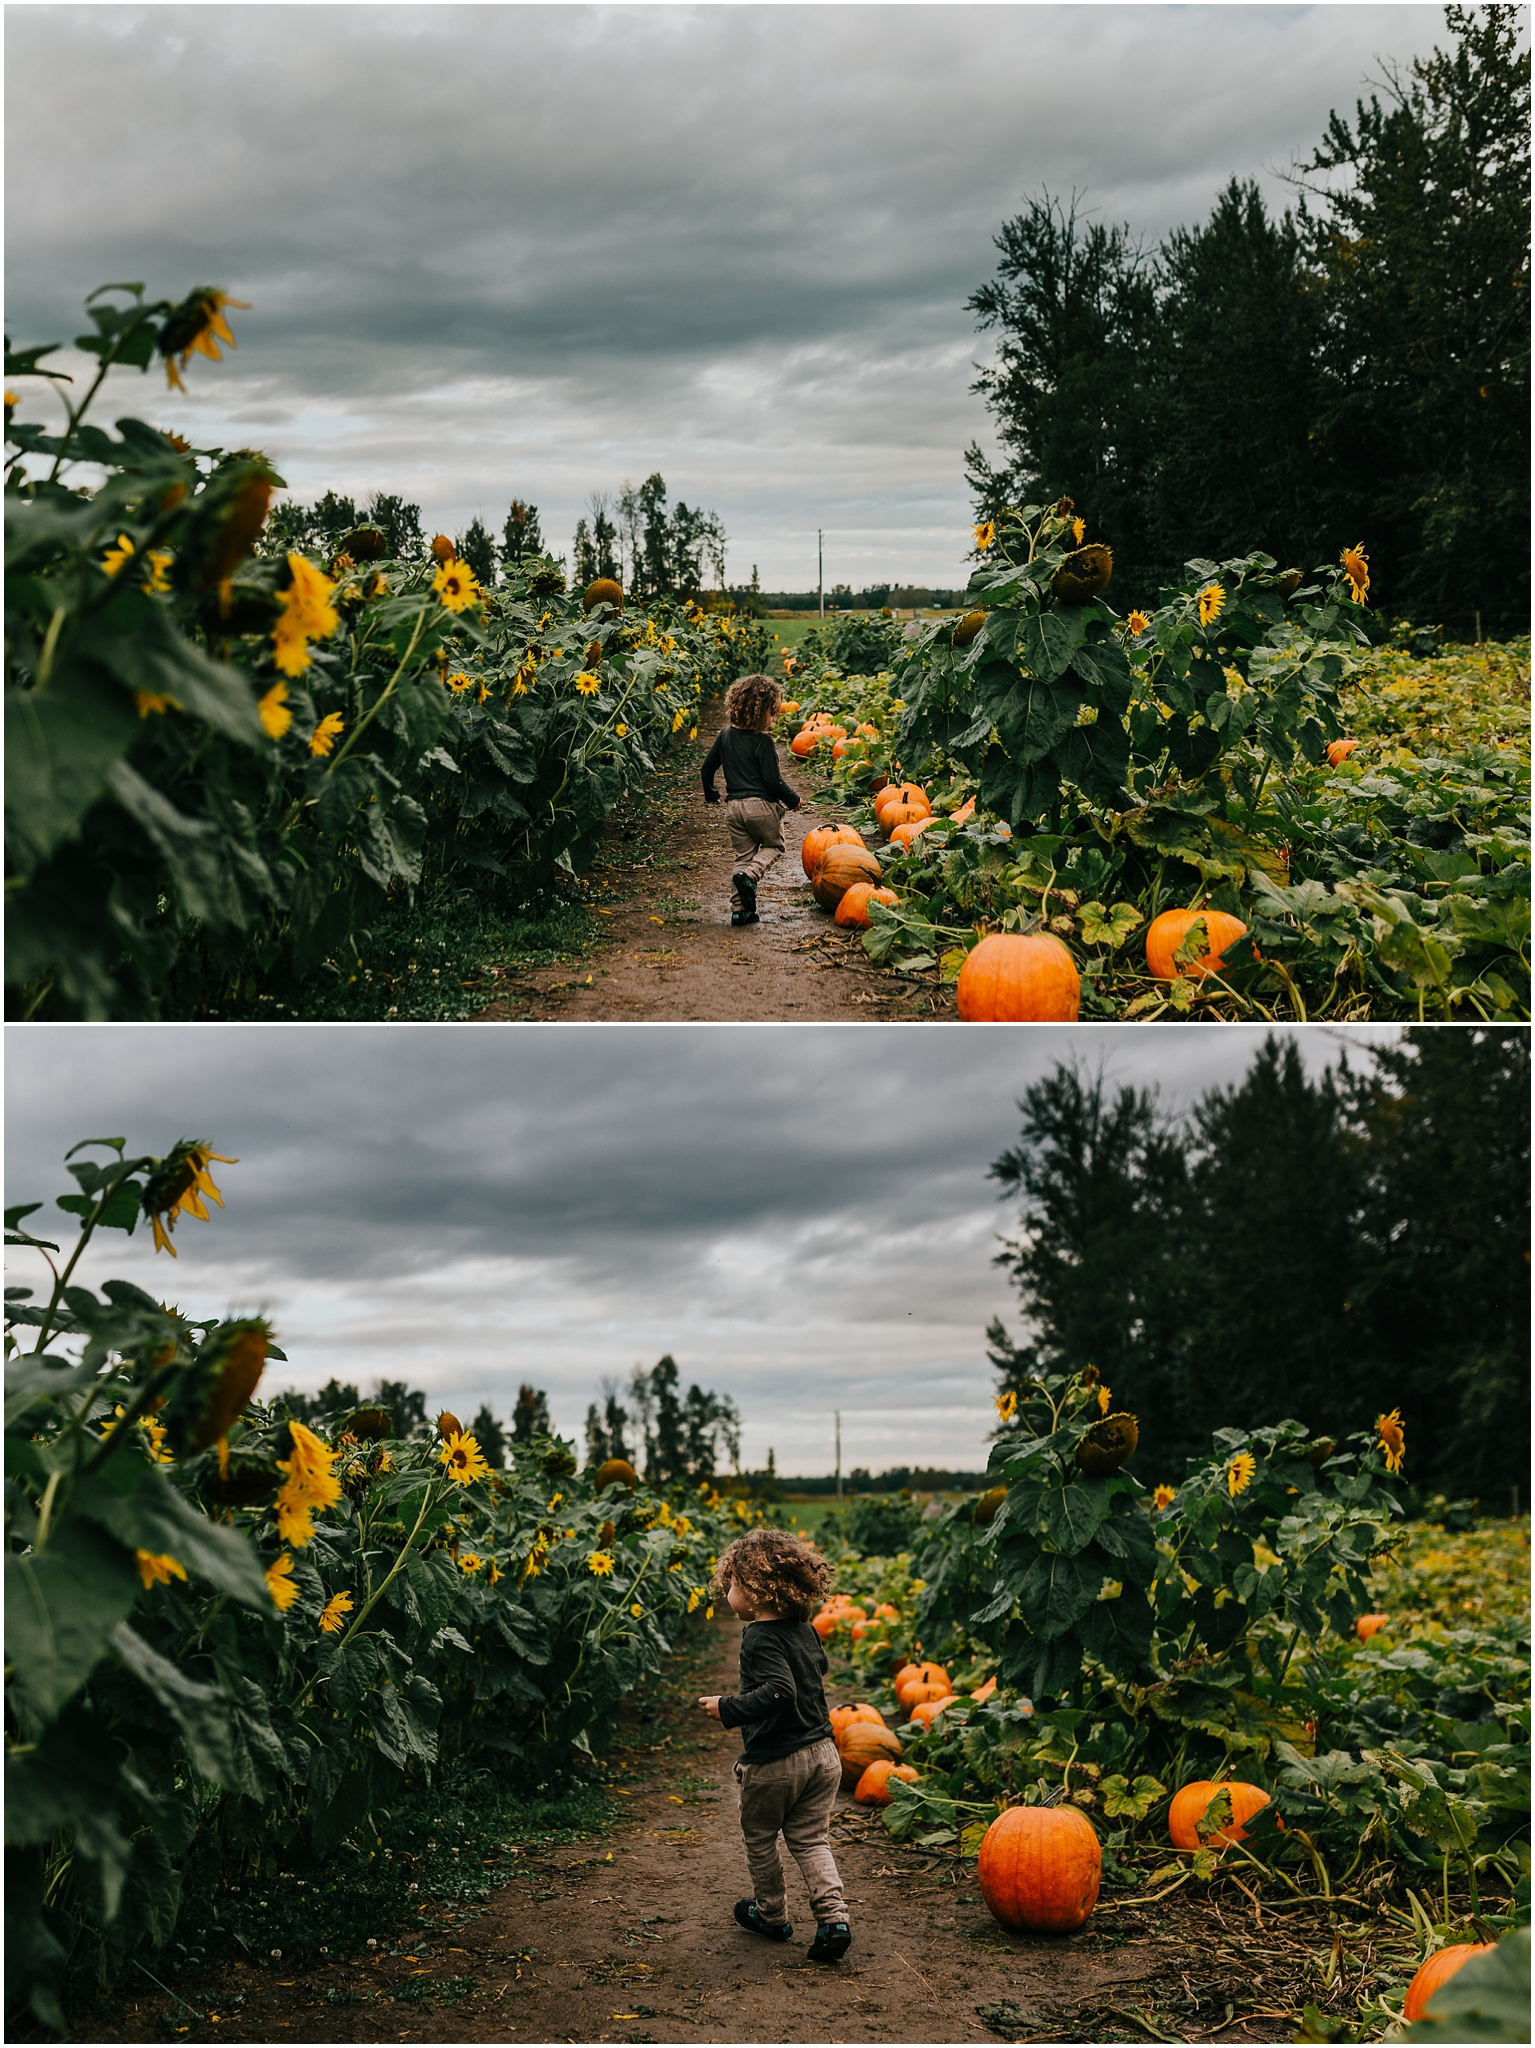 Treelines Photography - Edmonton Family Photographer - Edmonton U-Pick Pumpkins Patch - Adventure Photography